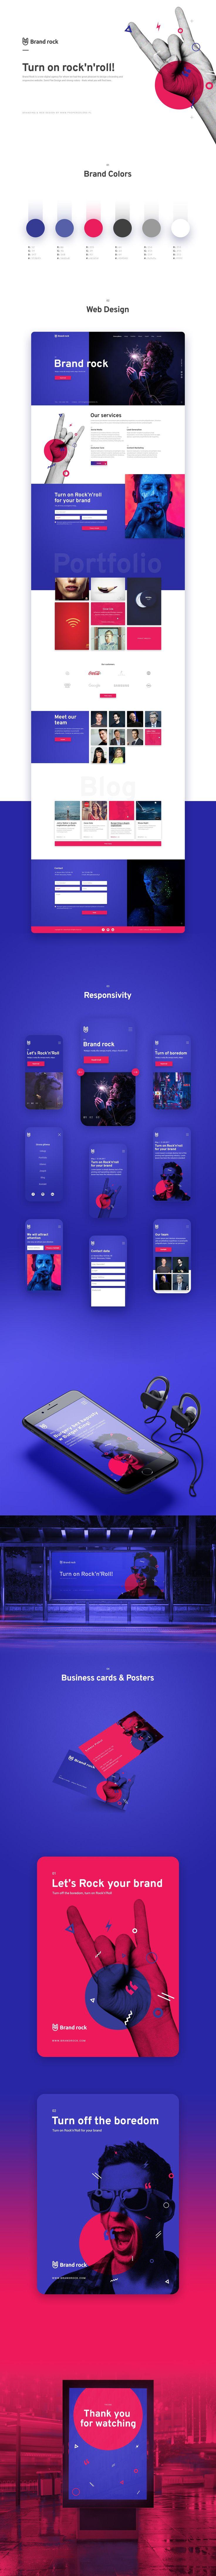 Branding and modern website design presentation